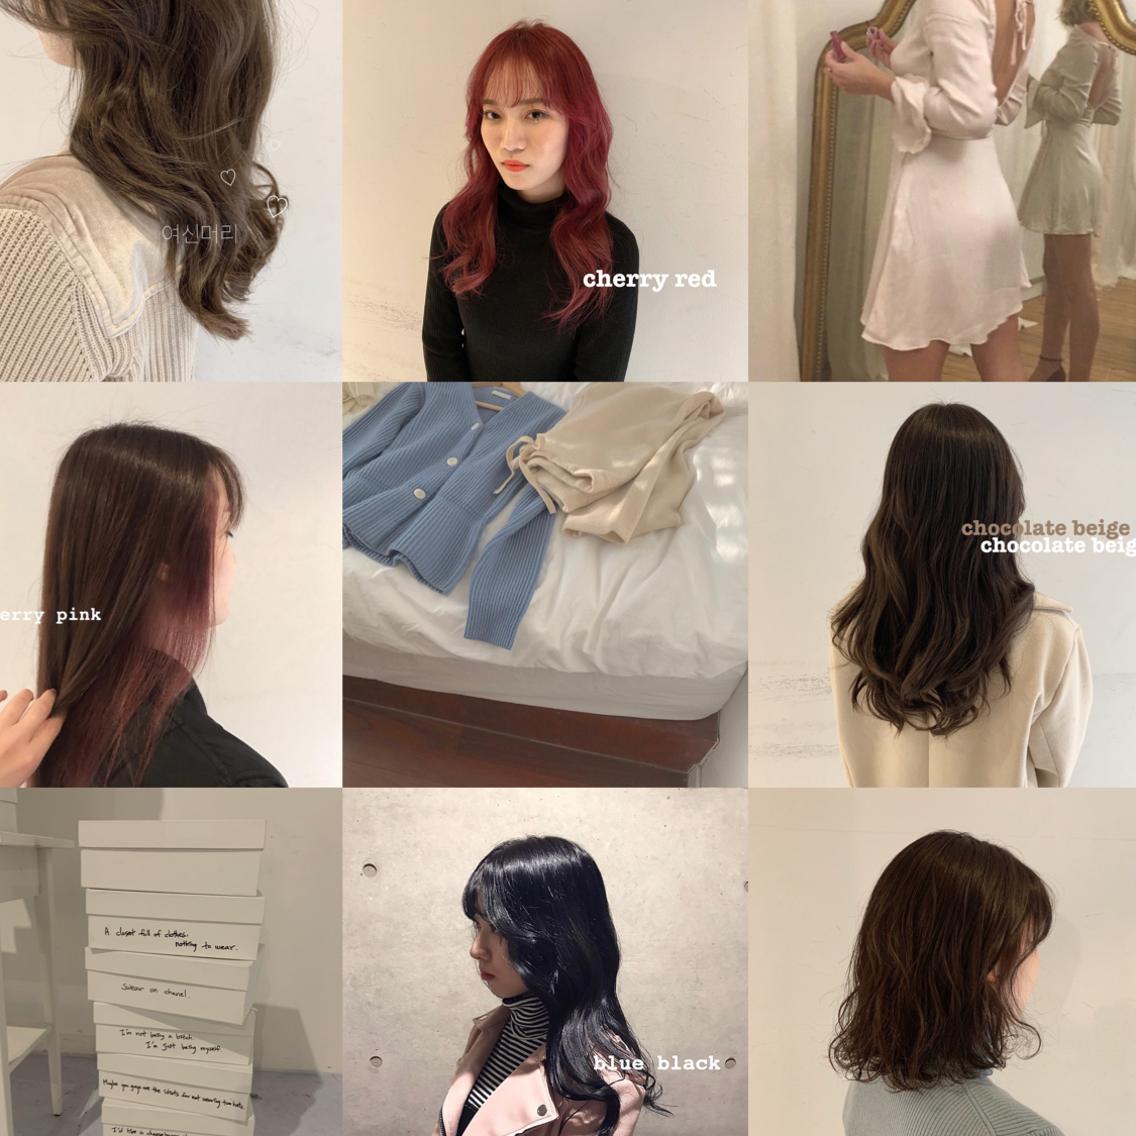 🇰🇷 minimo限定価格 🇰🇷 何度でも同じ価格 color + treatment ¥3240〈 insta @ayatangram 〉#韓国スタイル #オルチャンヘア #韓国